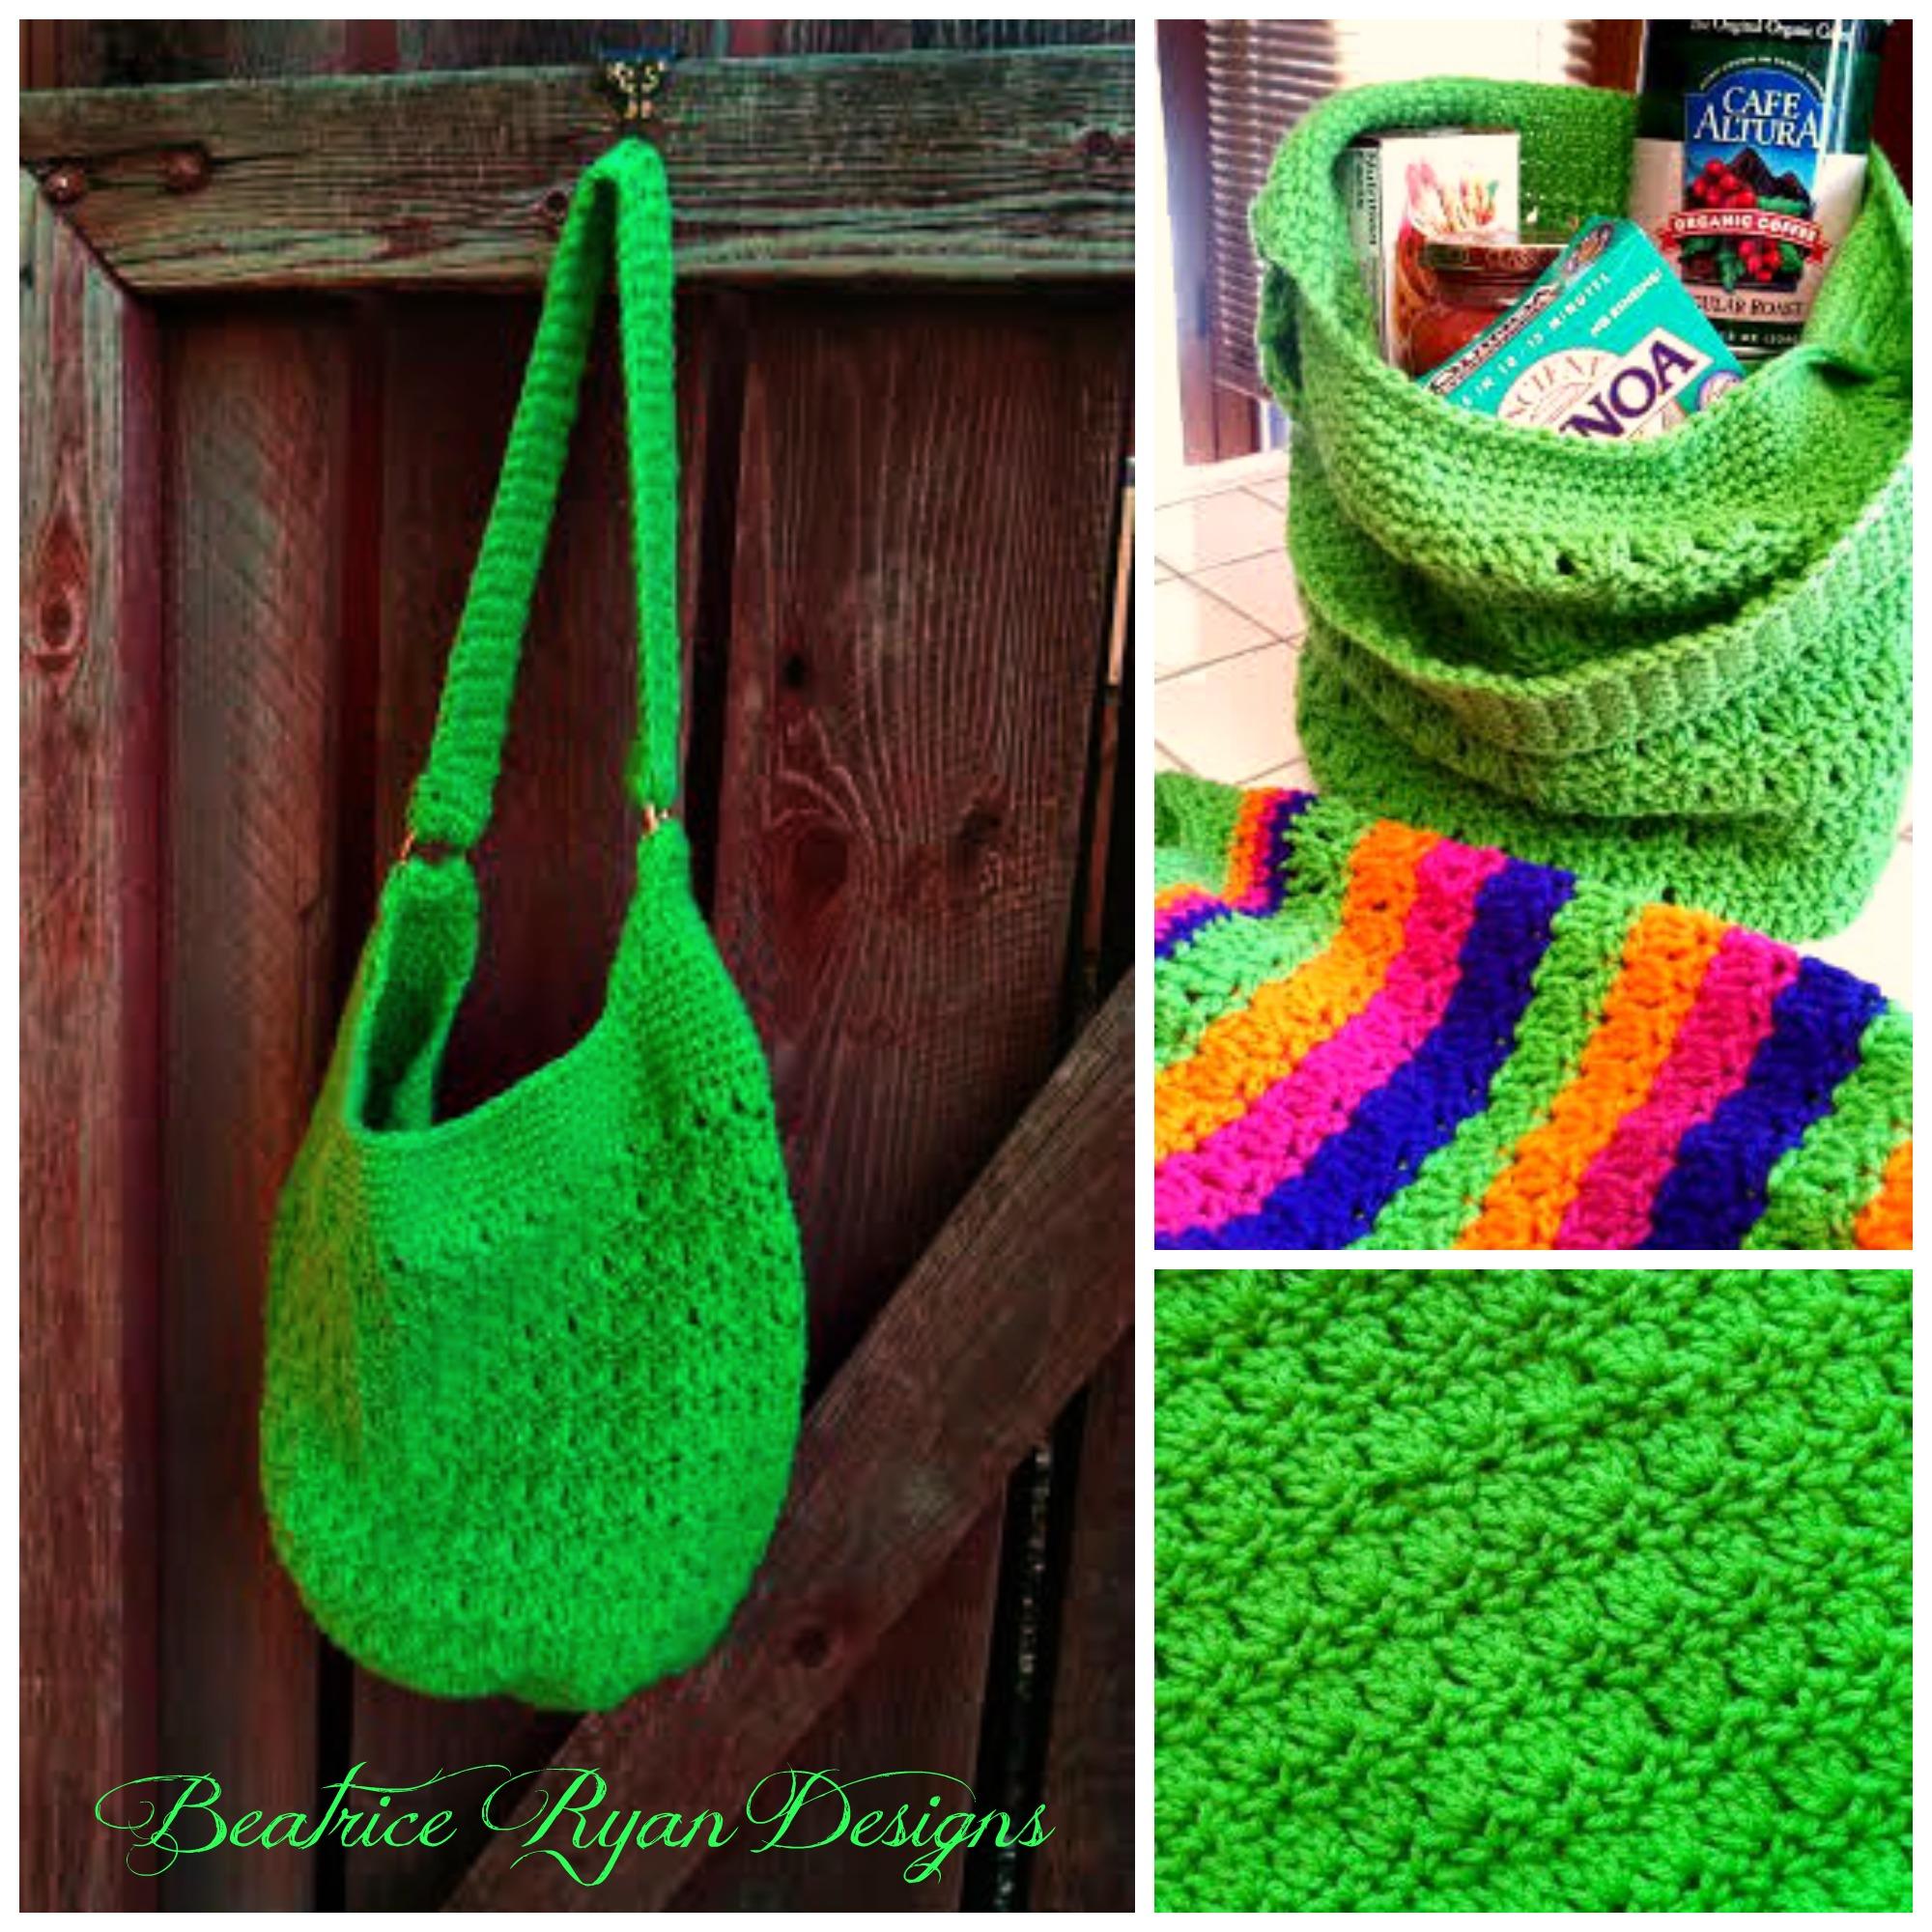 Amazing grace tote free crochet pattern amazing grace tote free pattern bankloansurffo Gallery